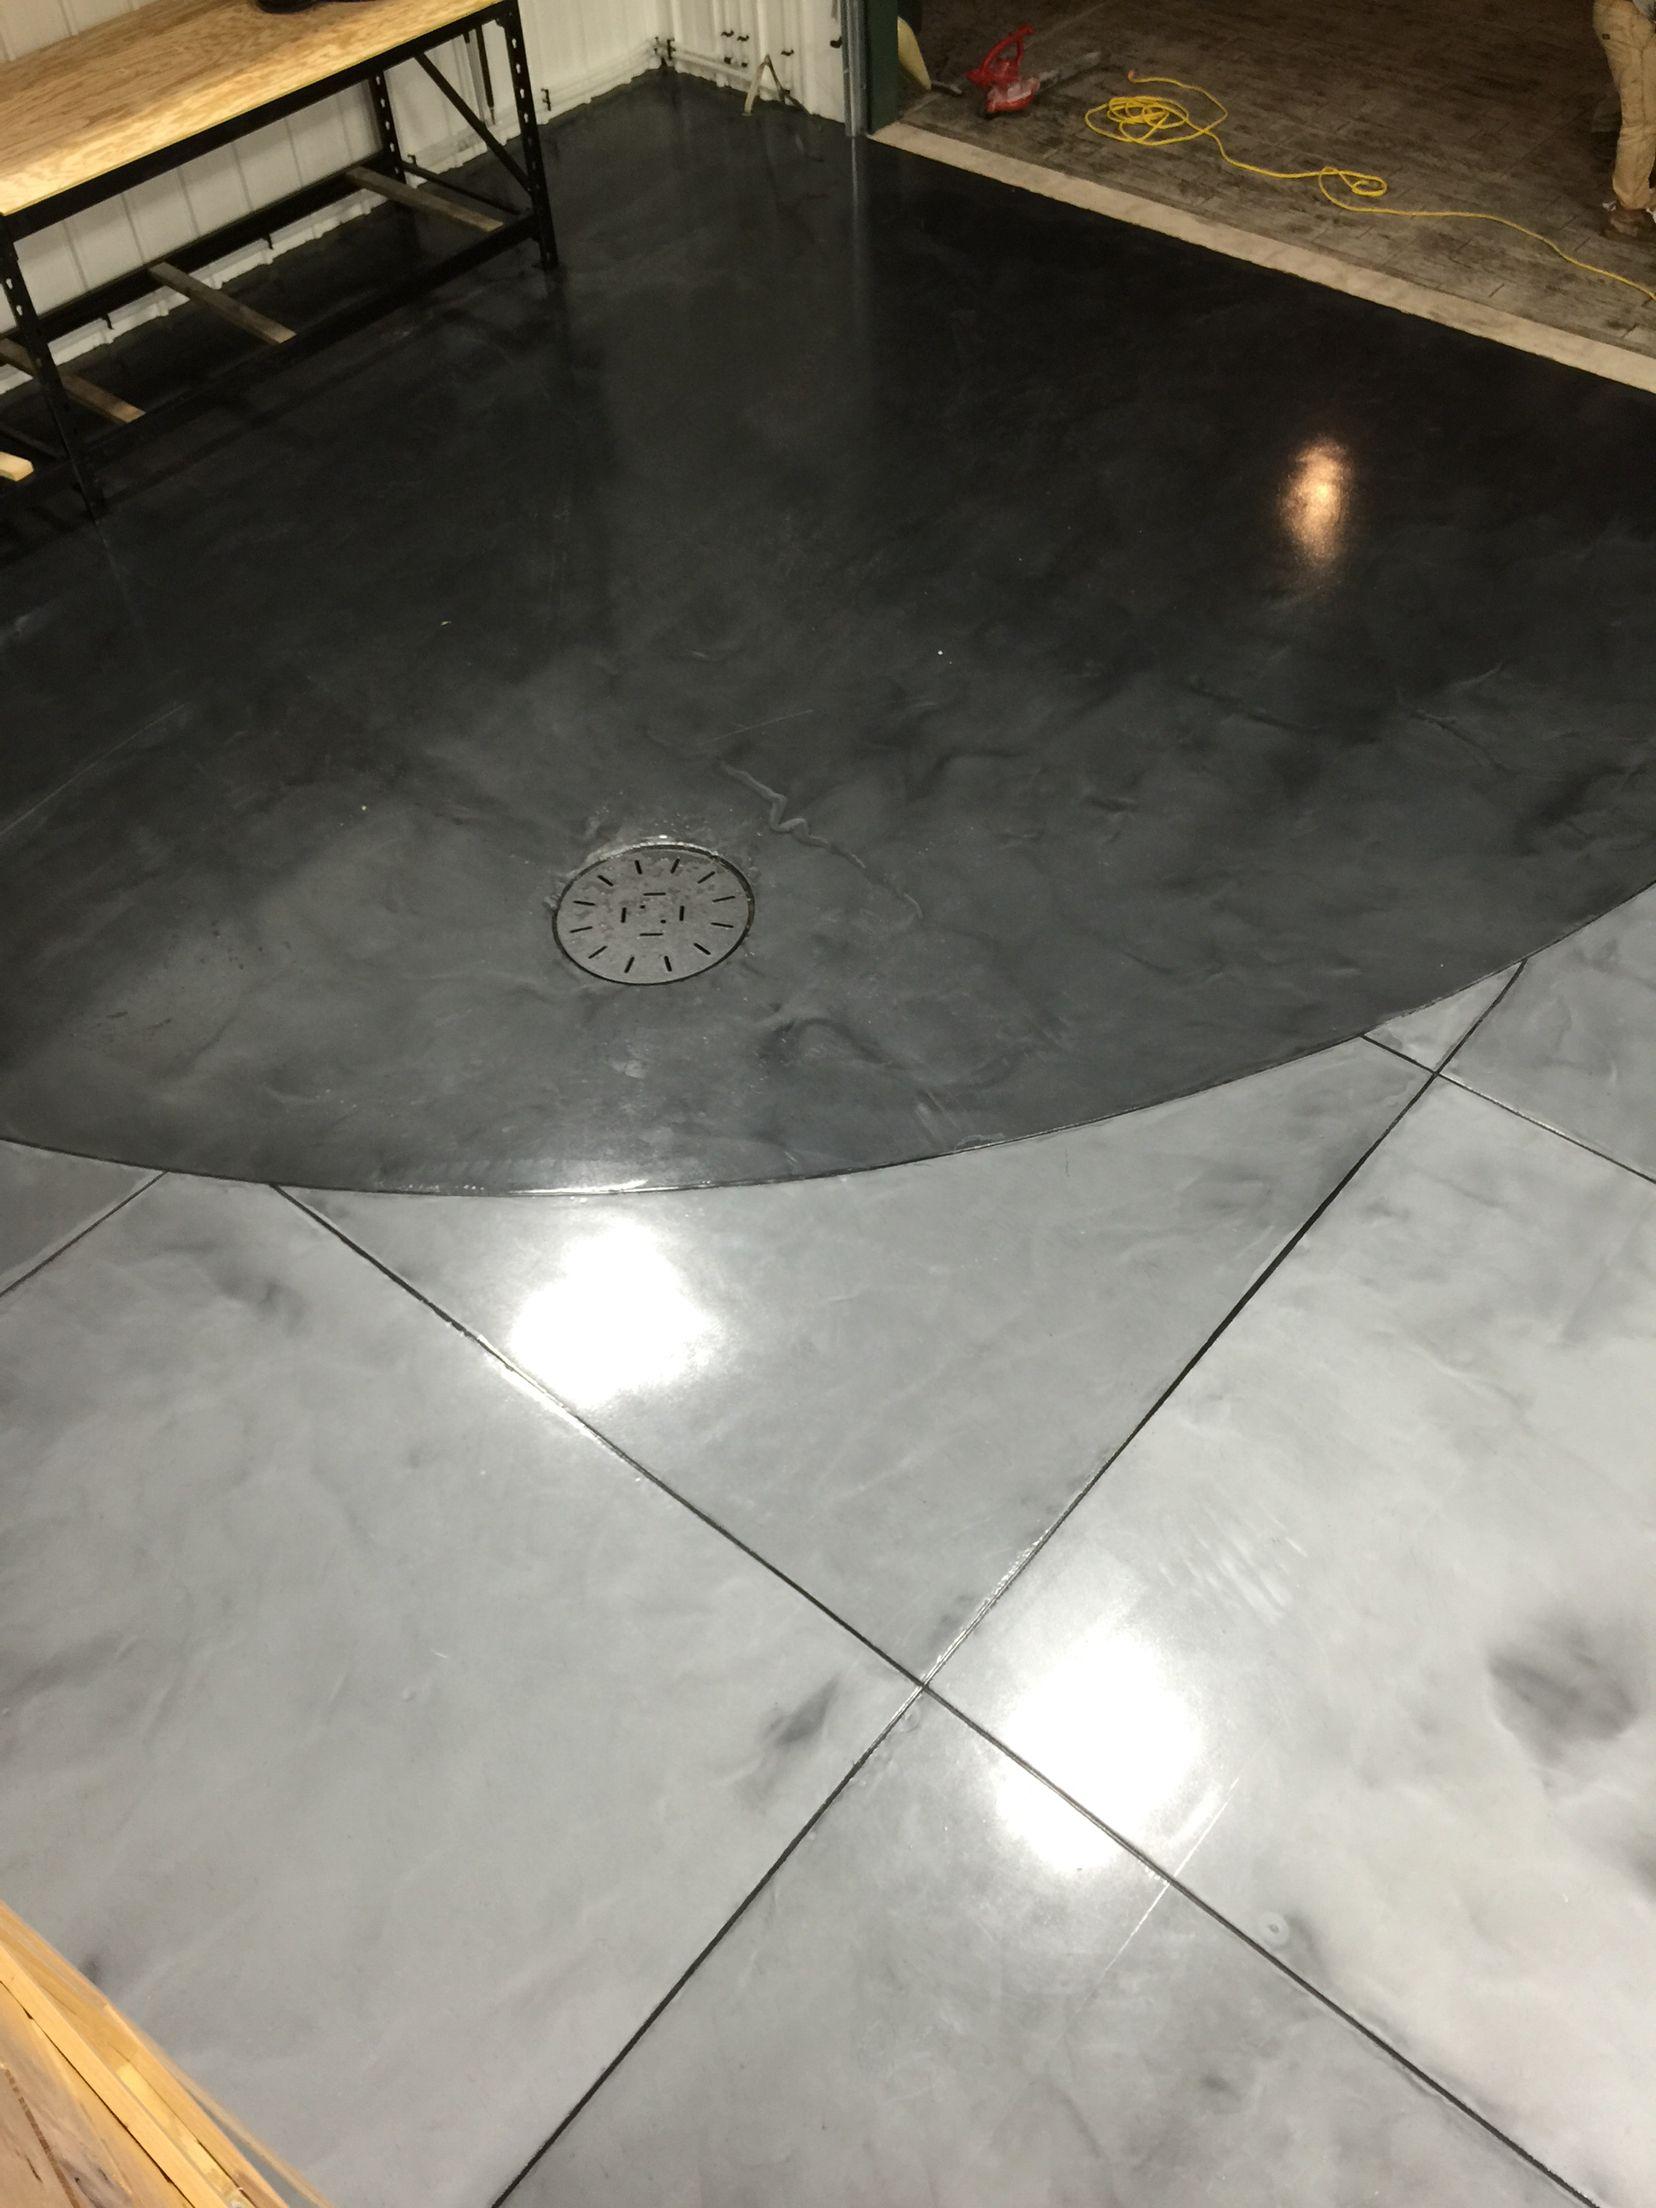 Metallic Epoxy Floor Coatings With Epoxy Grout Lines By Sierra